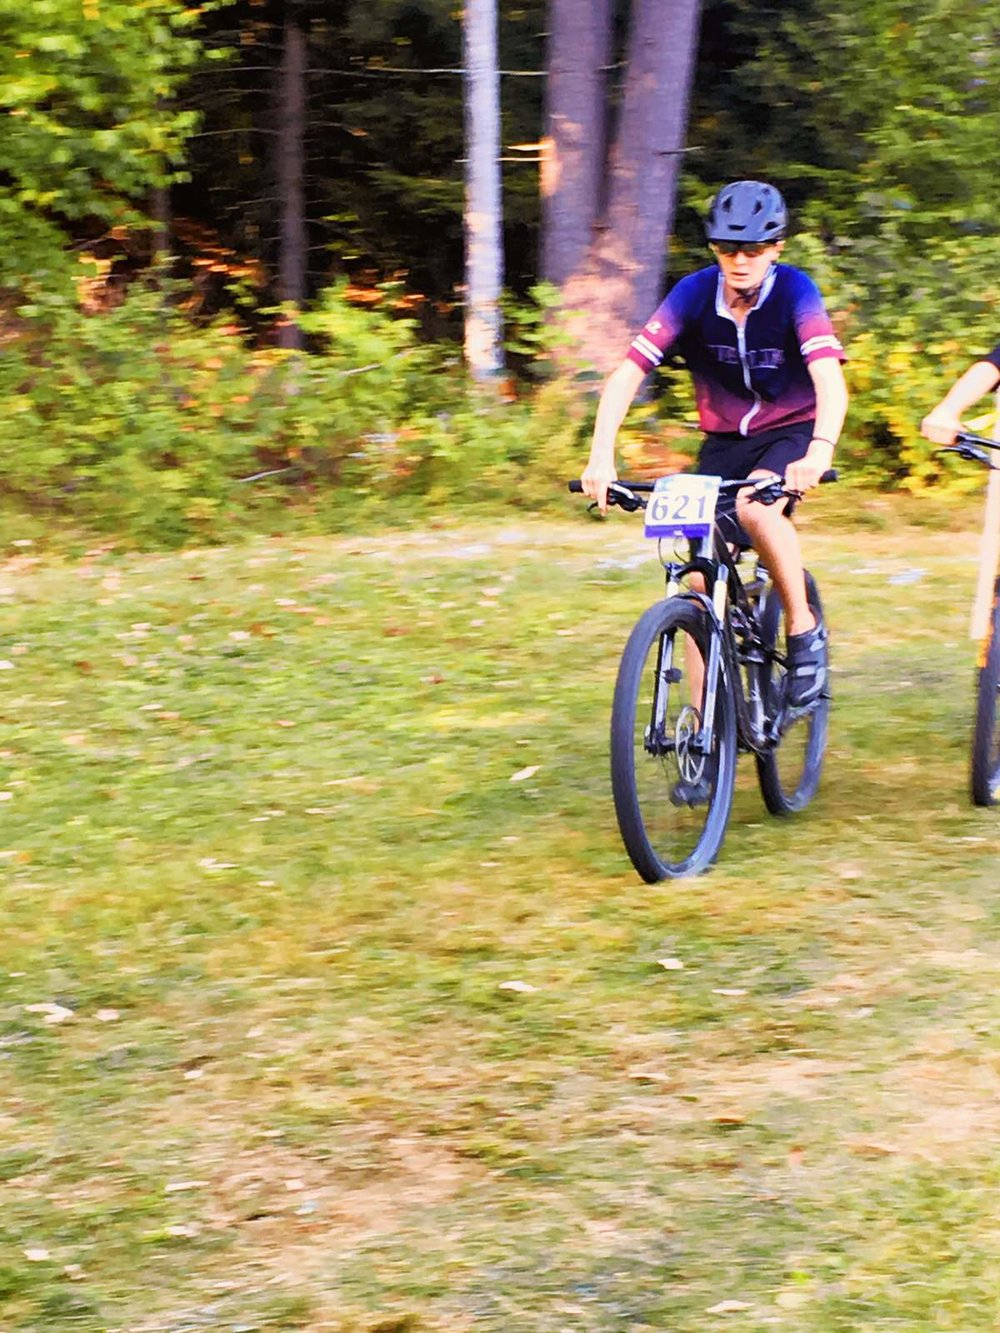 Mountain Biking at Vermont Academy - September 27, 2017  - 7942.JPG